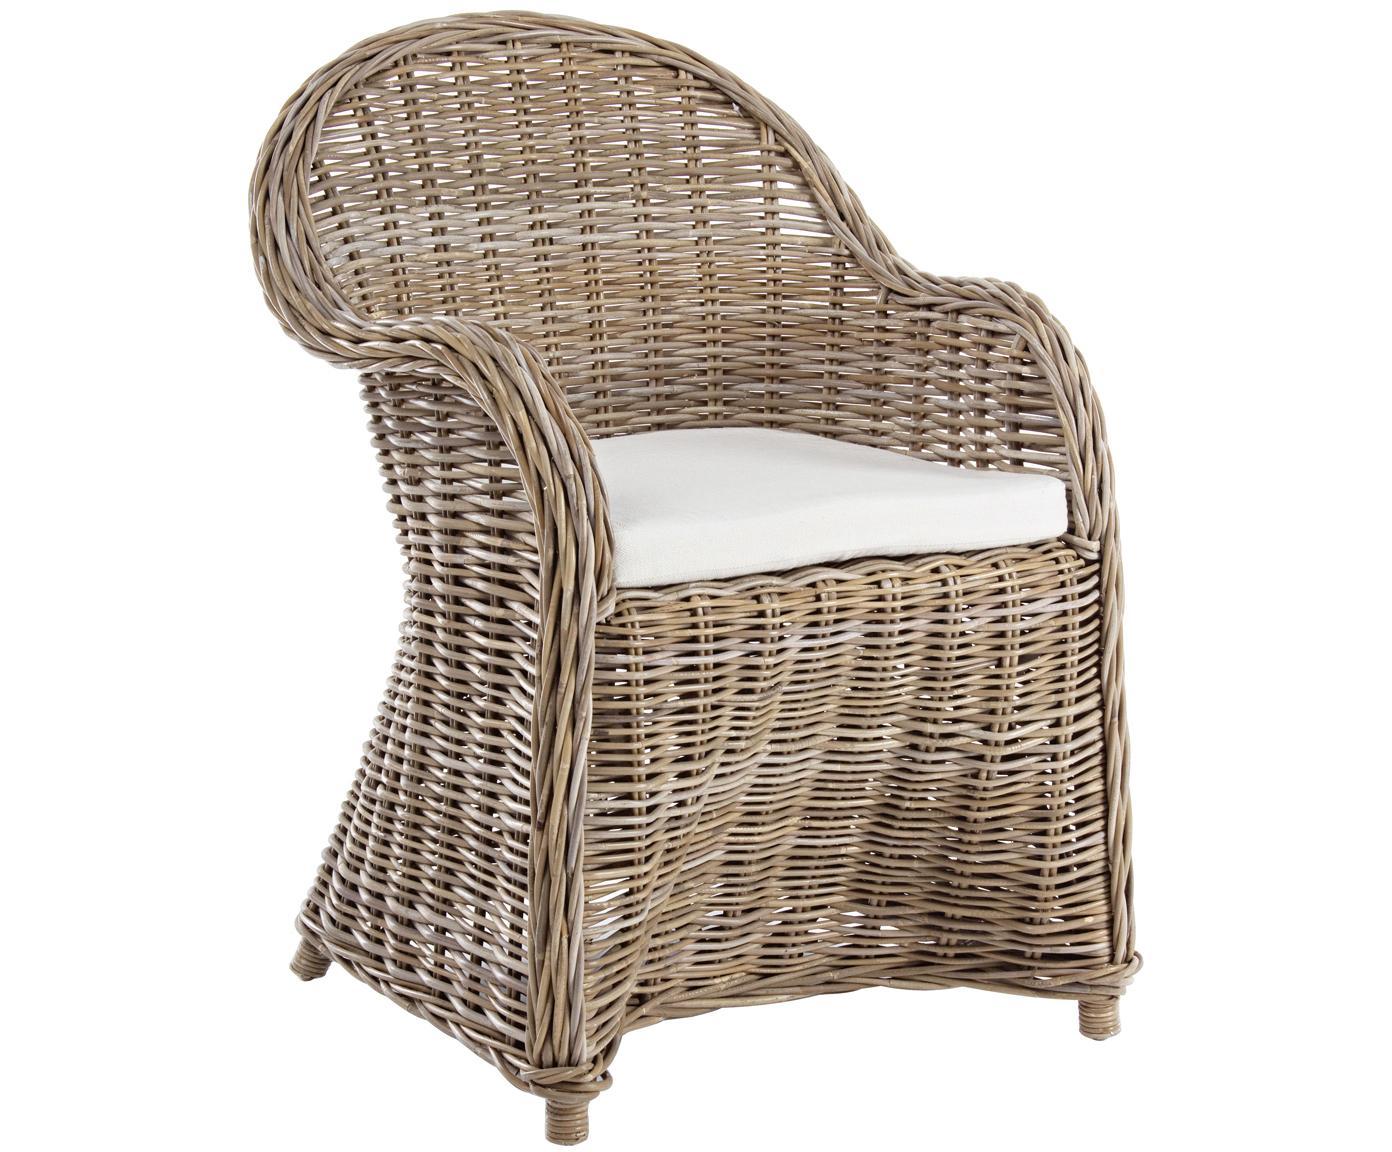 Sedia in rattan Martin, Intreccio: rattan Cuscino: bianco, Larg. 60 x Alt. 89 cm